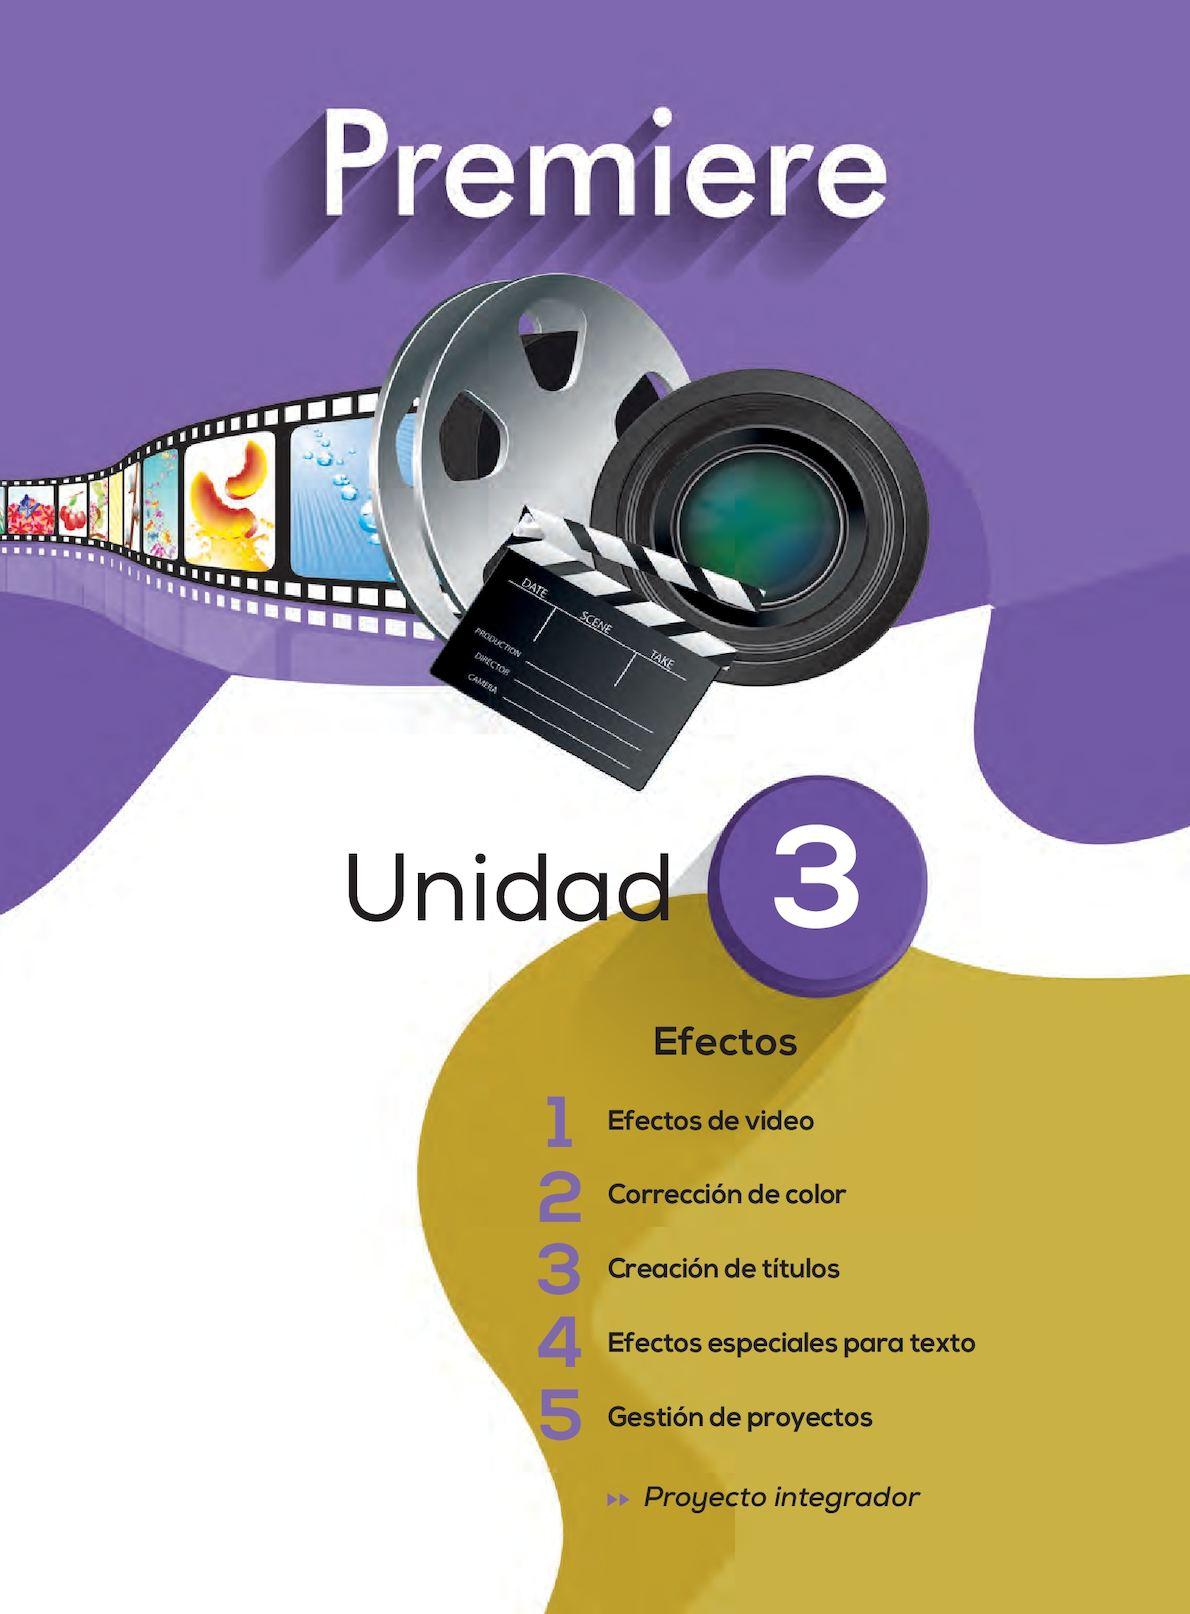 EDI04 CDT Unidad 3 - PREMIERE RED